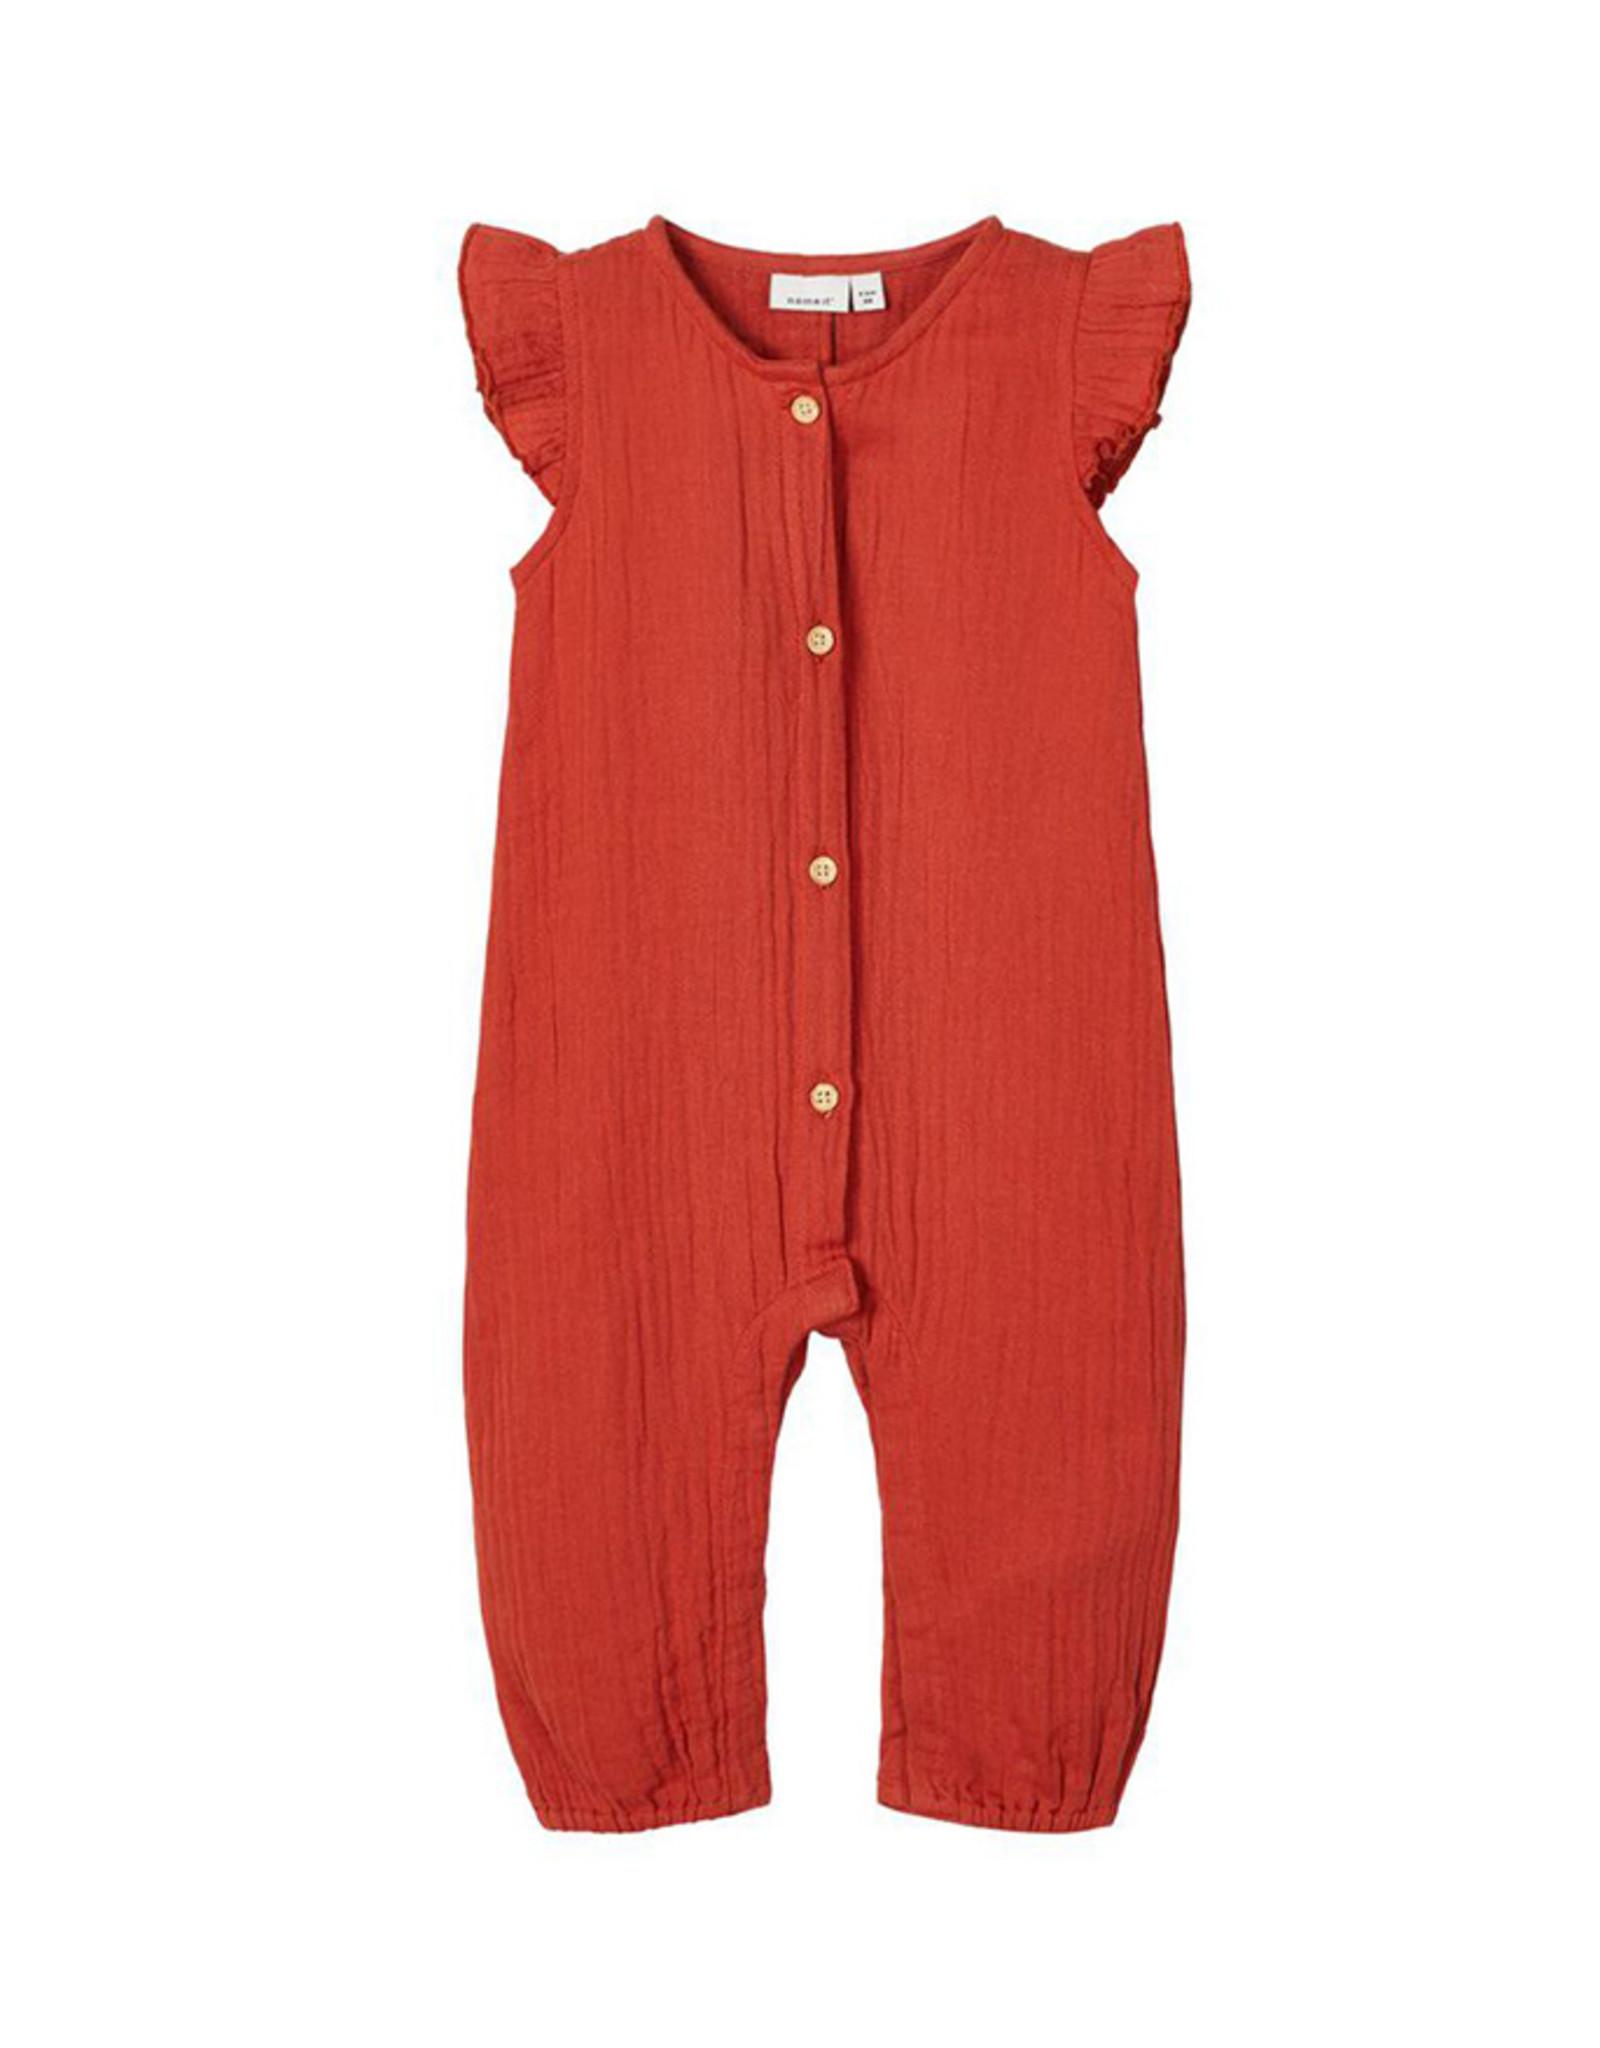 Nitush Suit Red